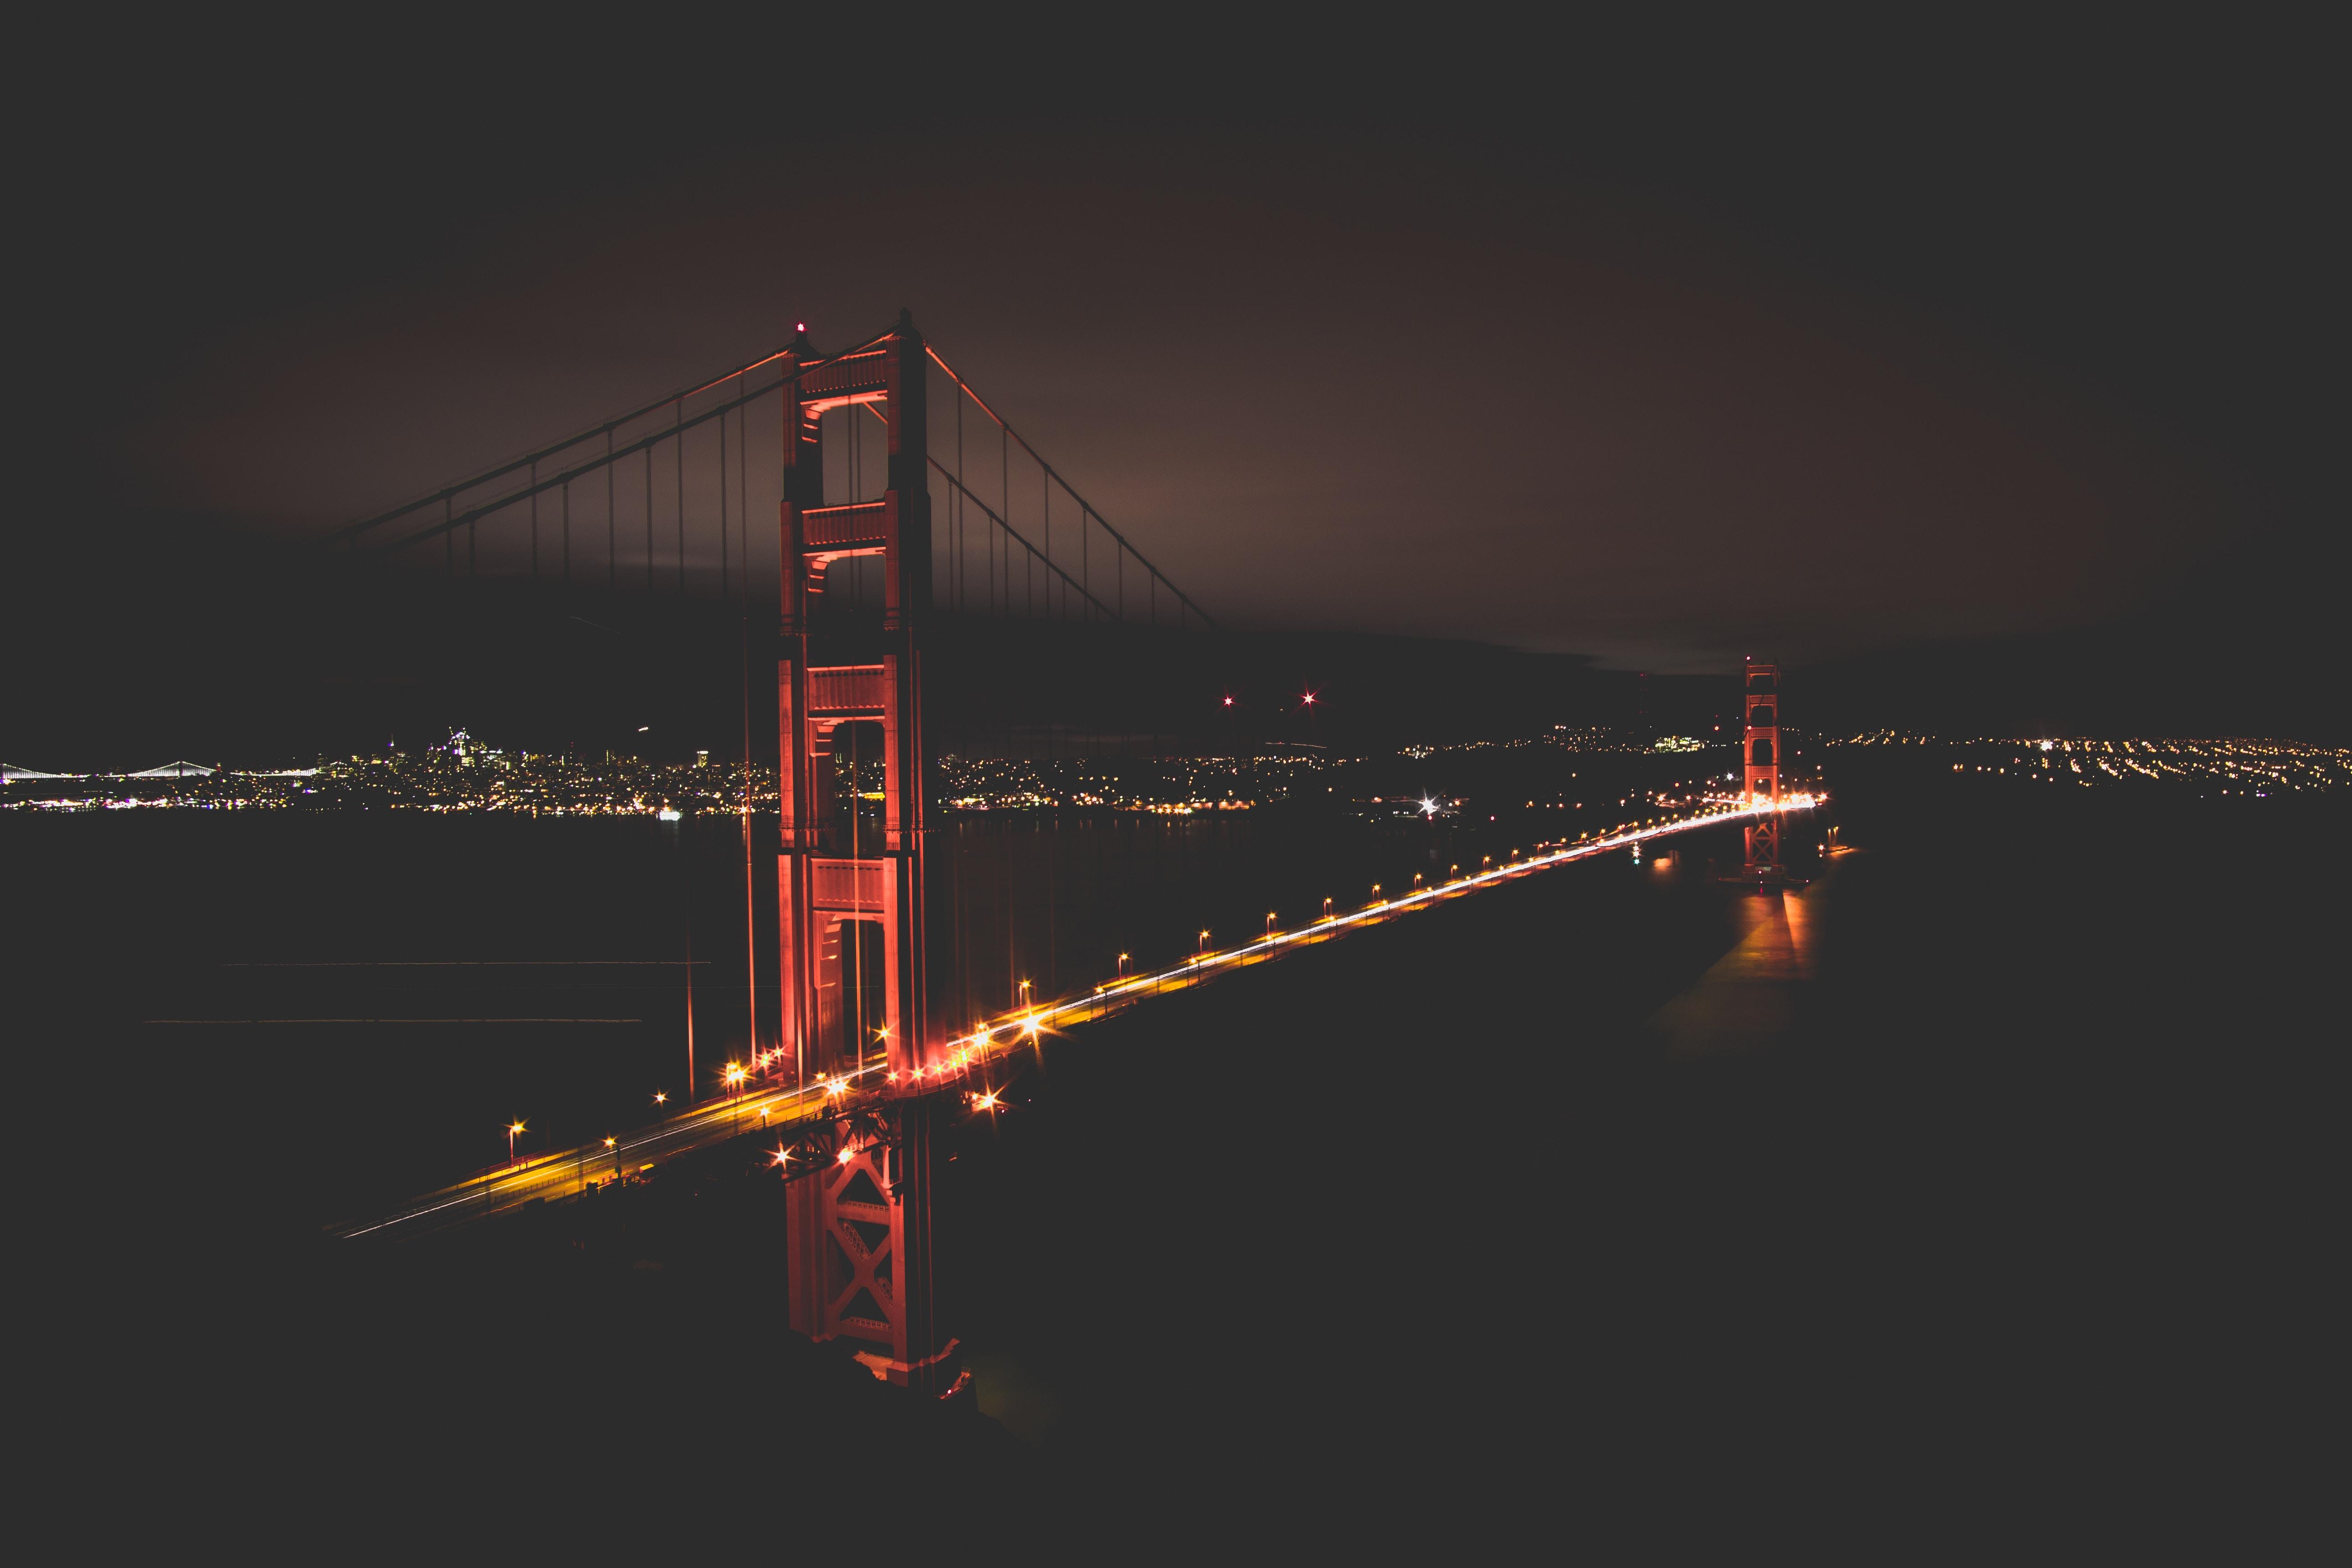 Golden Gate Bridge At Night Time, HD World, 4k Wallpapers ...